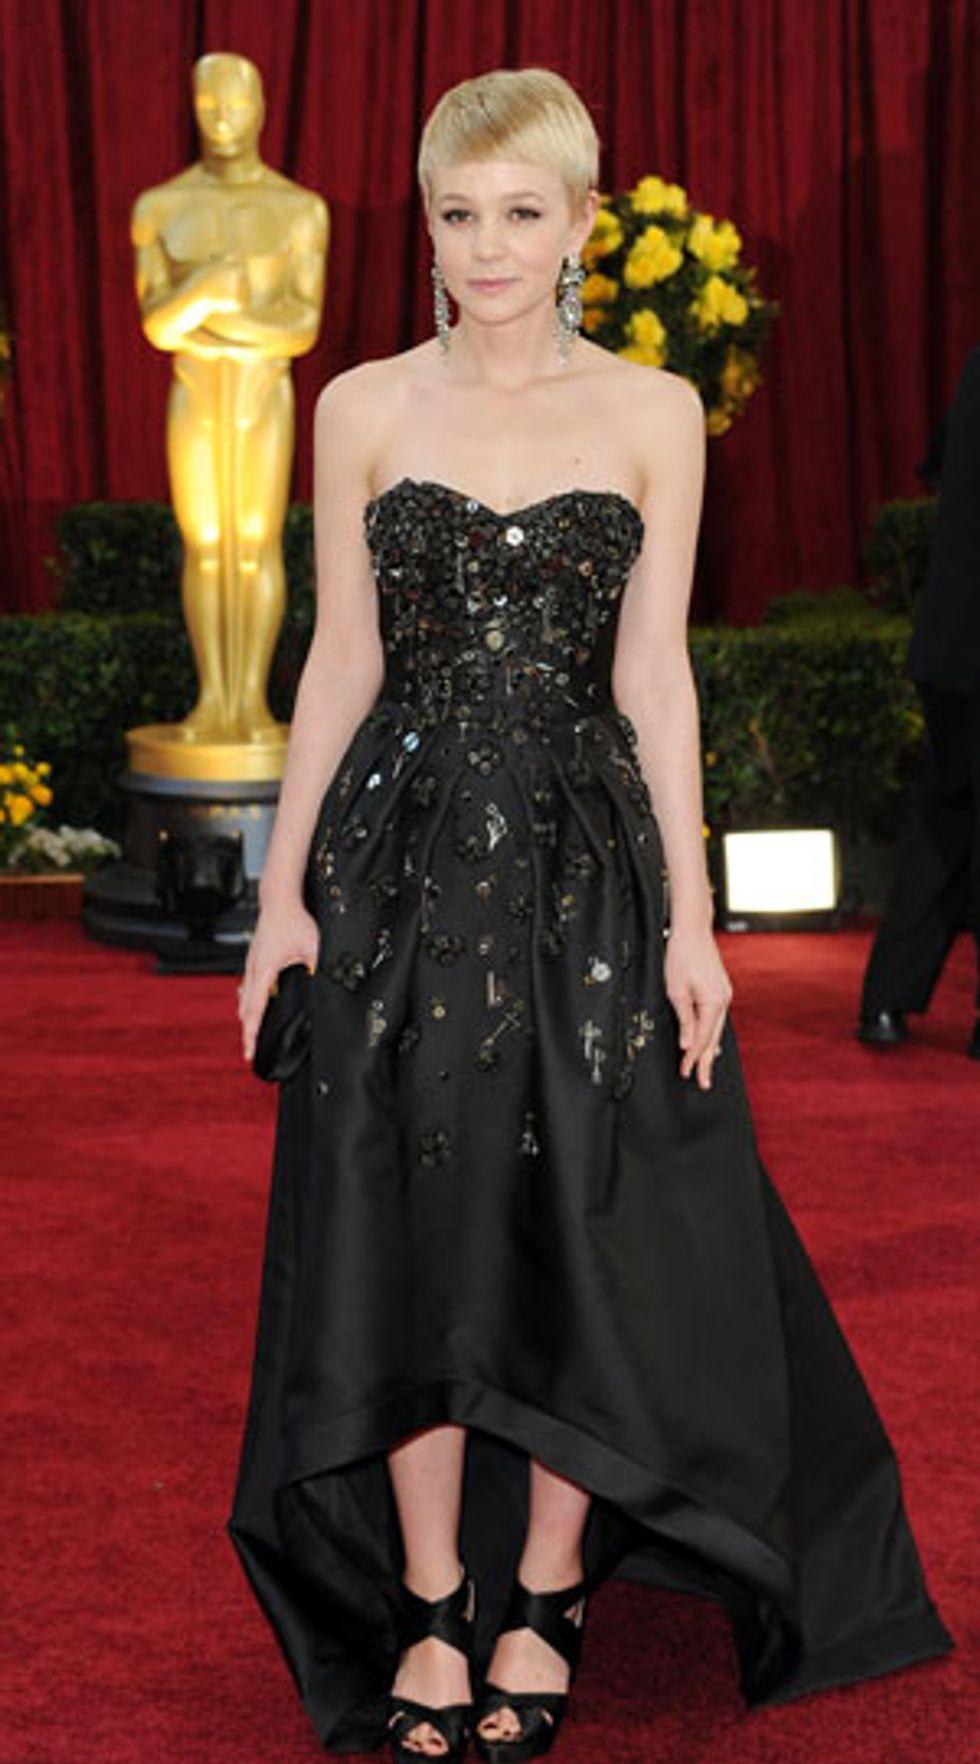 Carey Mulligan as Eliza Doolittle!